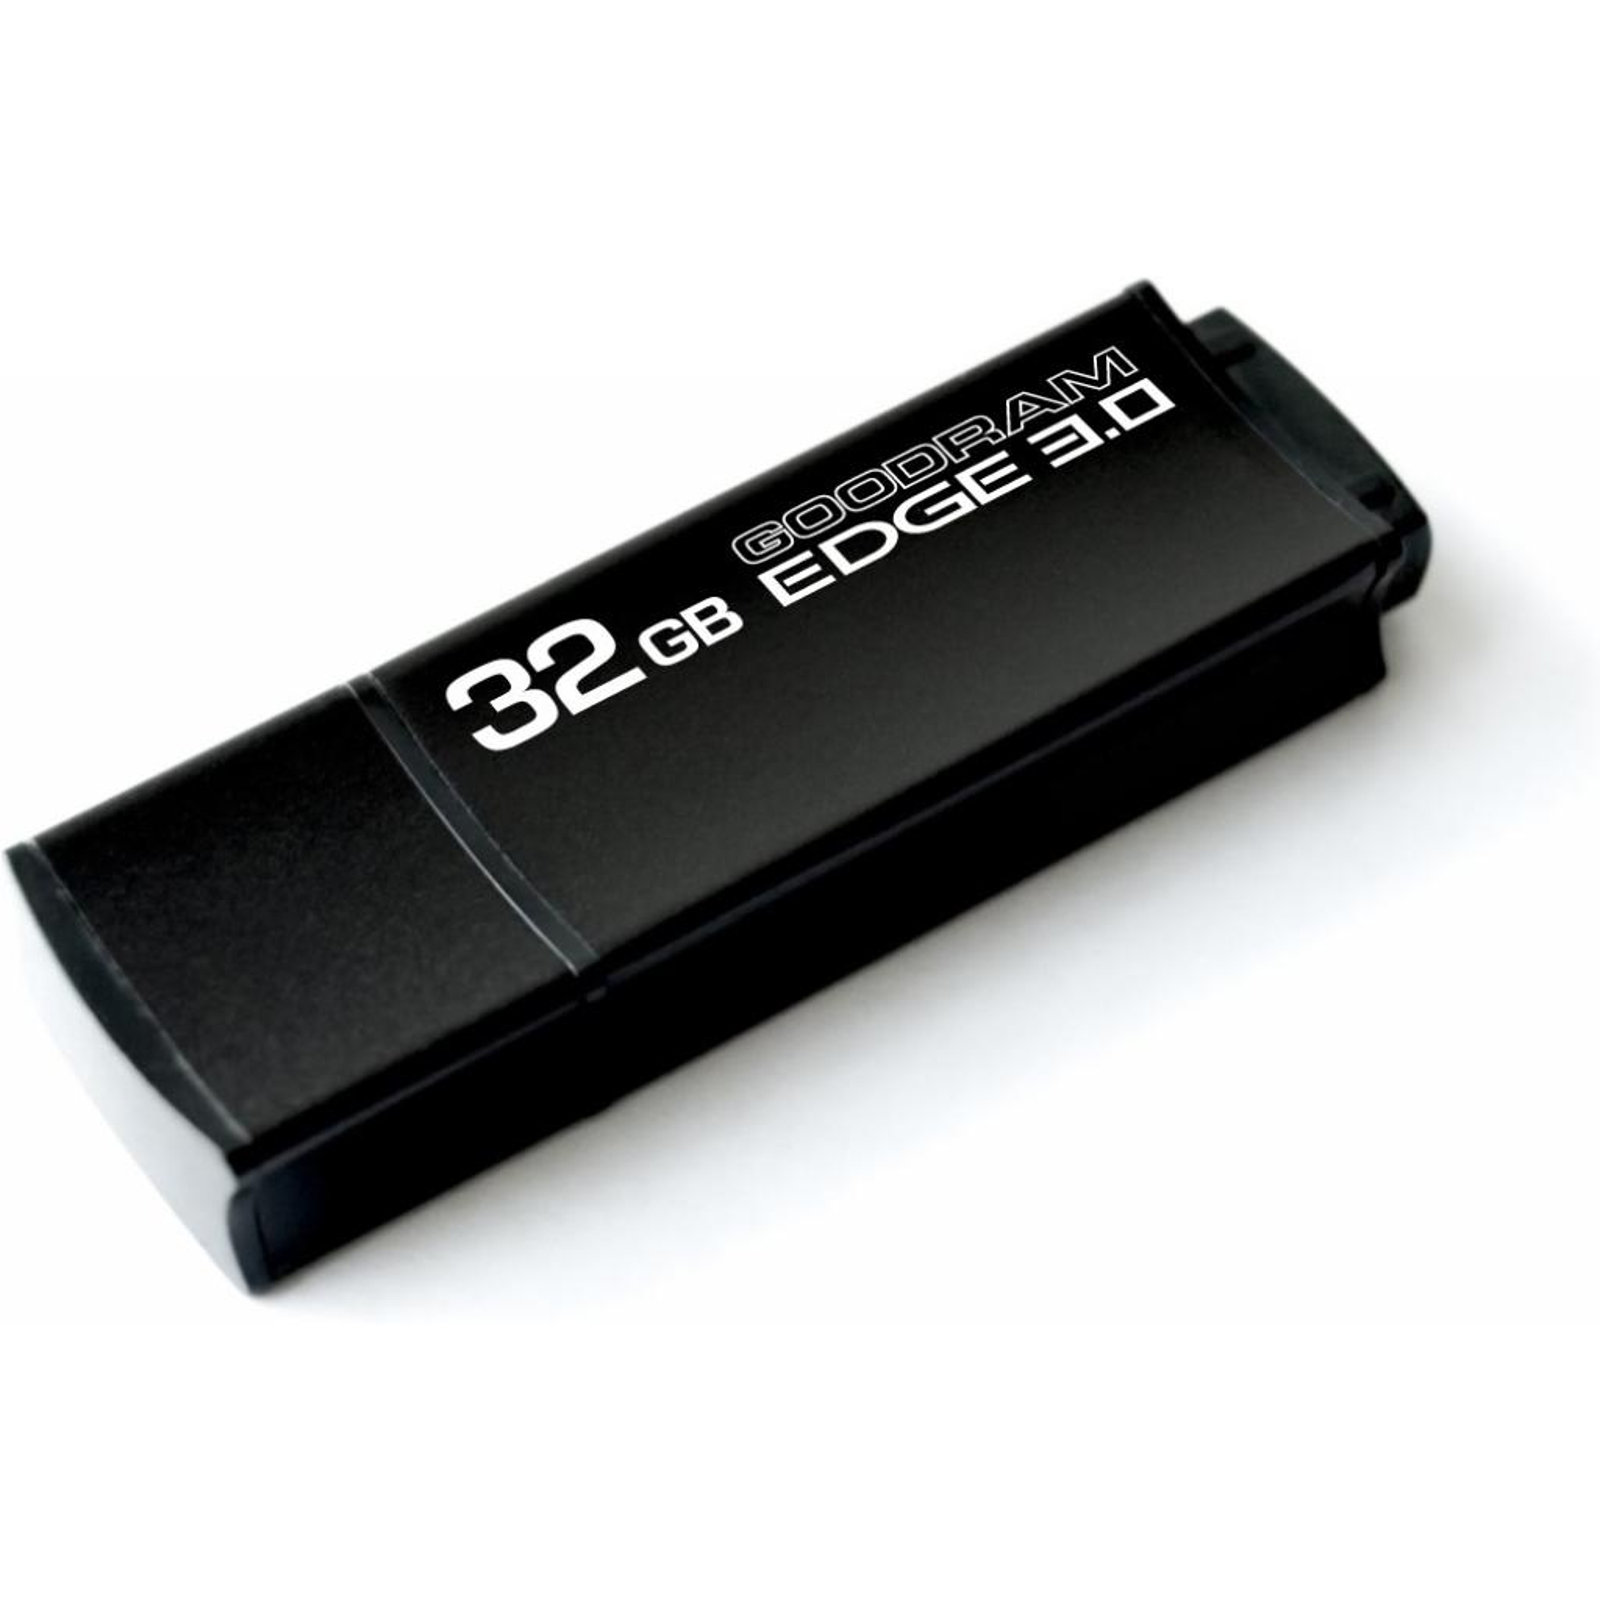 USB флеш накопитель Goodram 8Gb Edge (PD8GH2GREGRR9) изображение 2